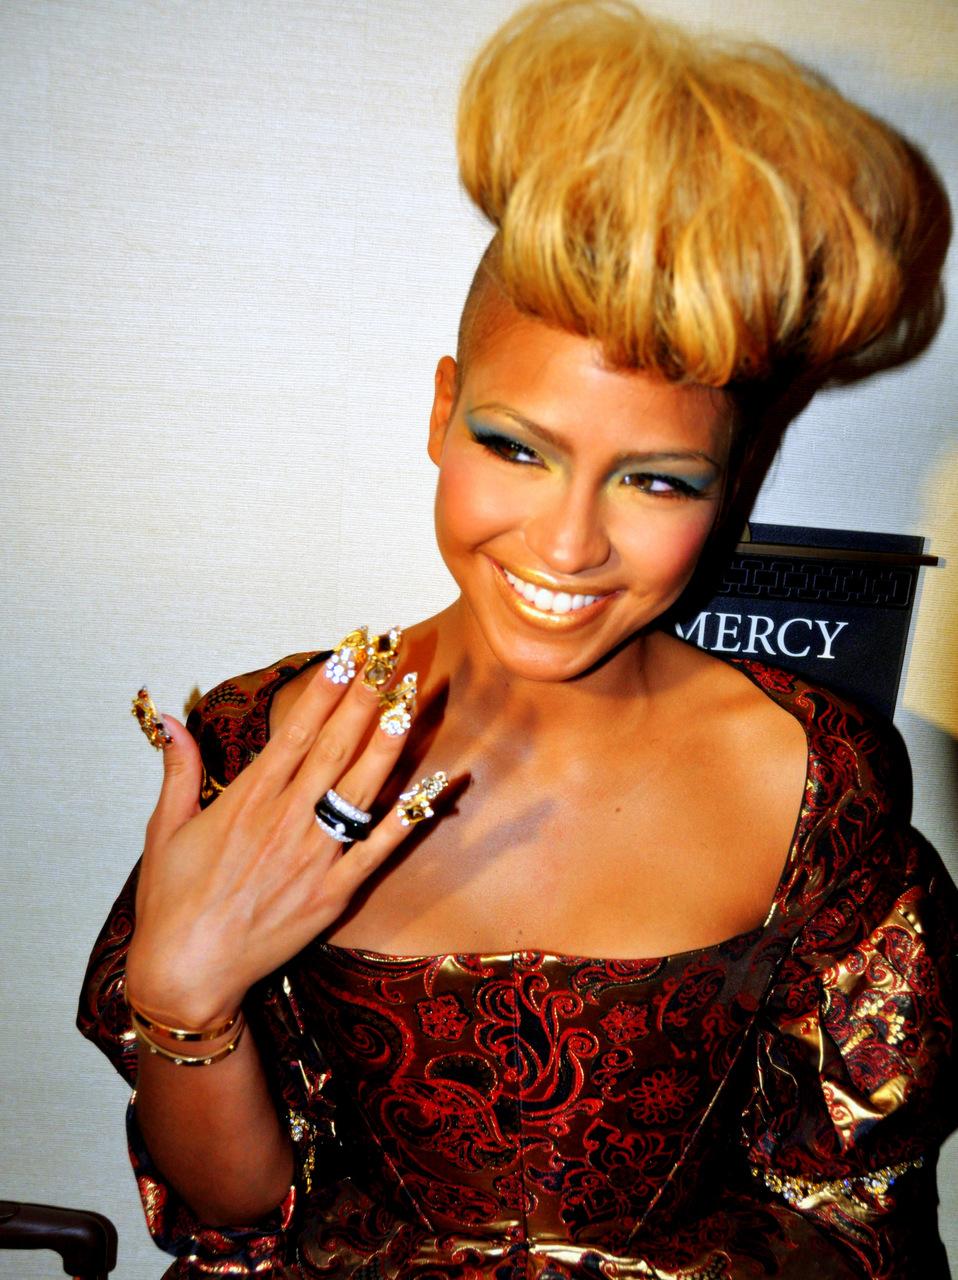 Keyshia Dior Hairstyles 2013 Cassie: style chronicles